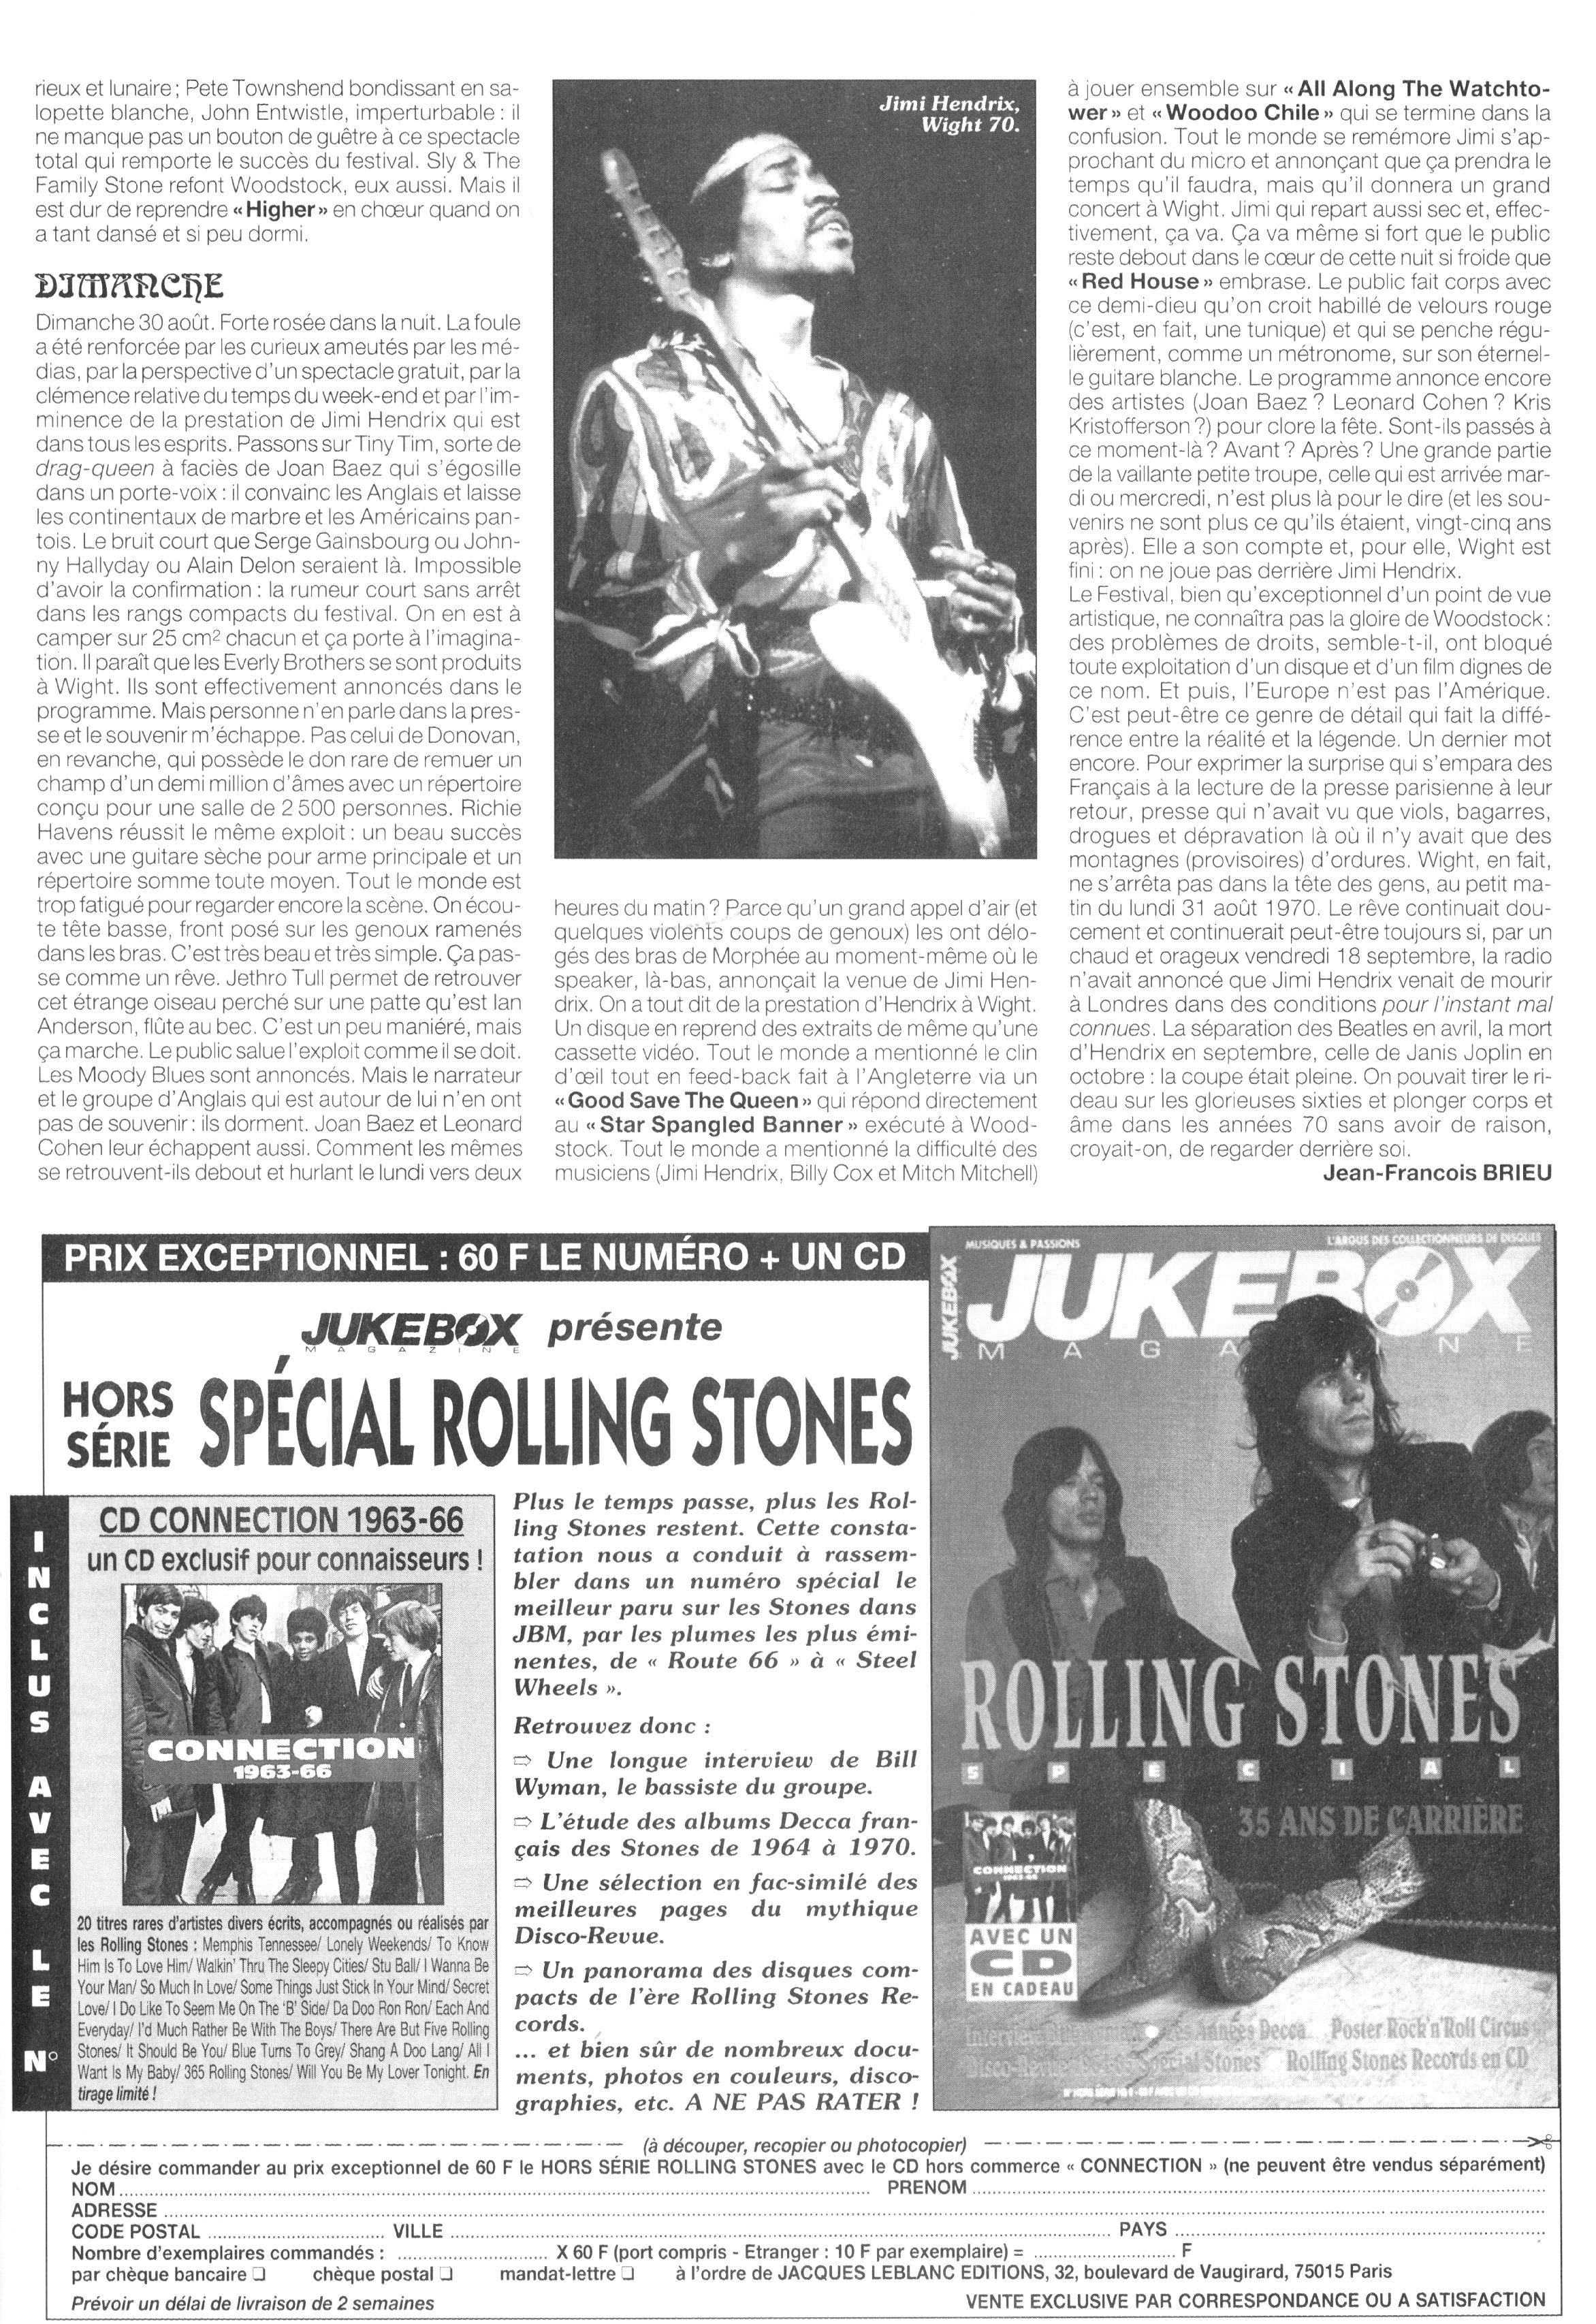 Magazines Français 1989 - 2014 JukeBoxSeptembre1995Page65